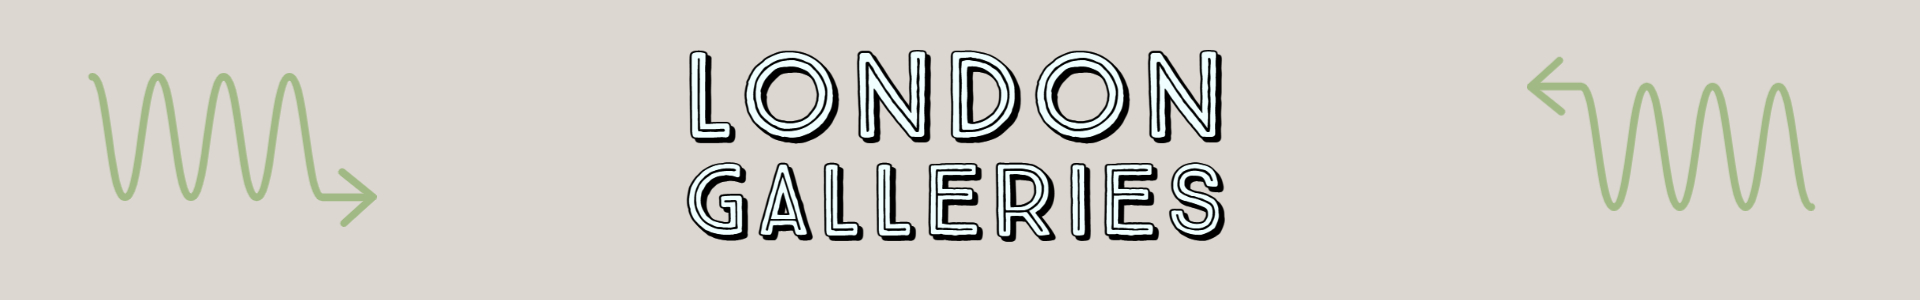 London's Galleries